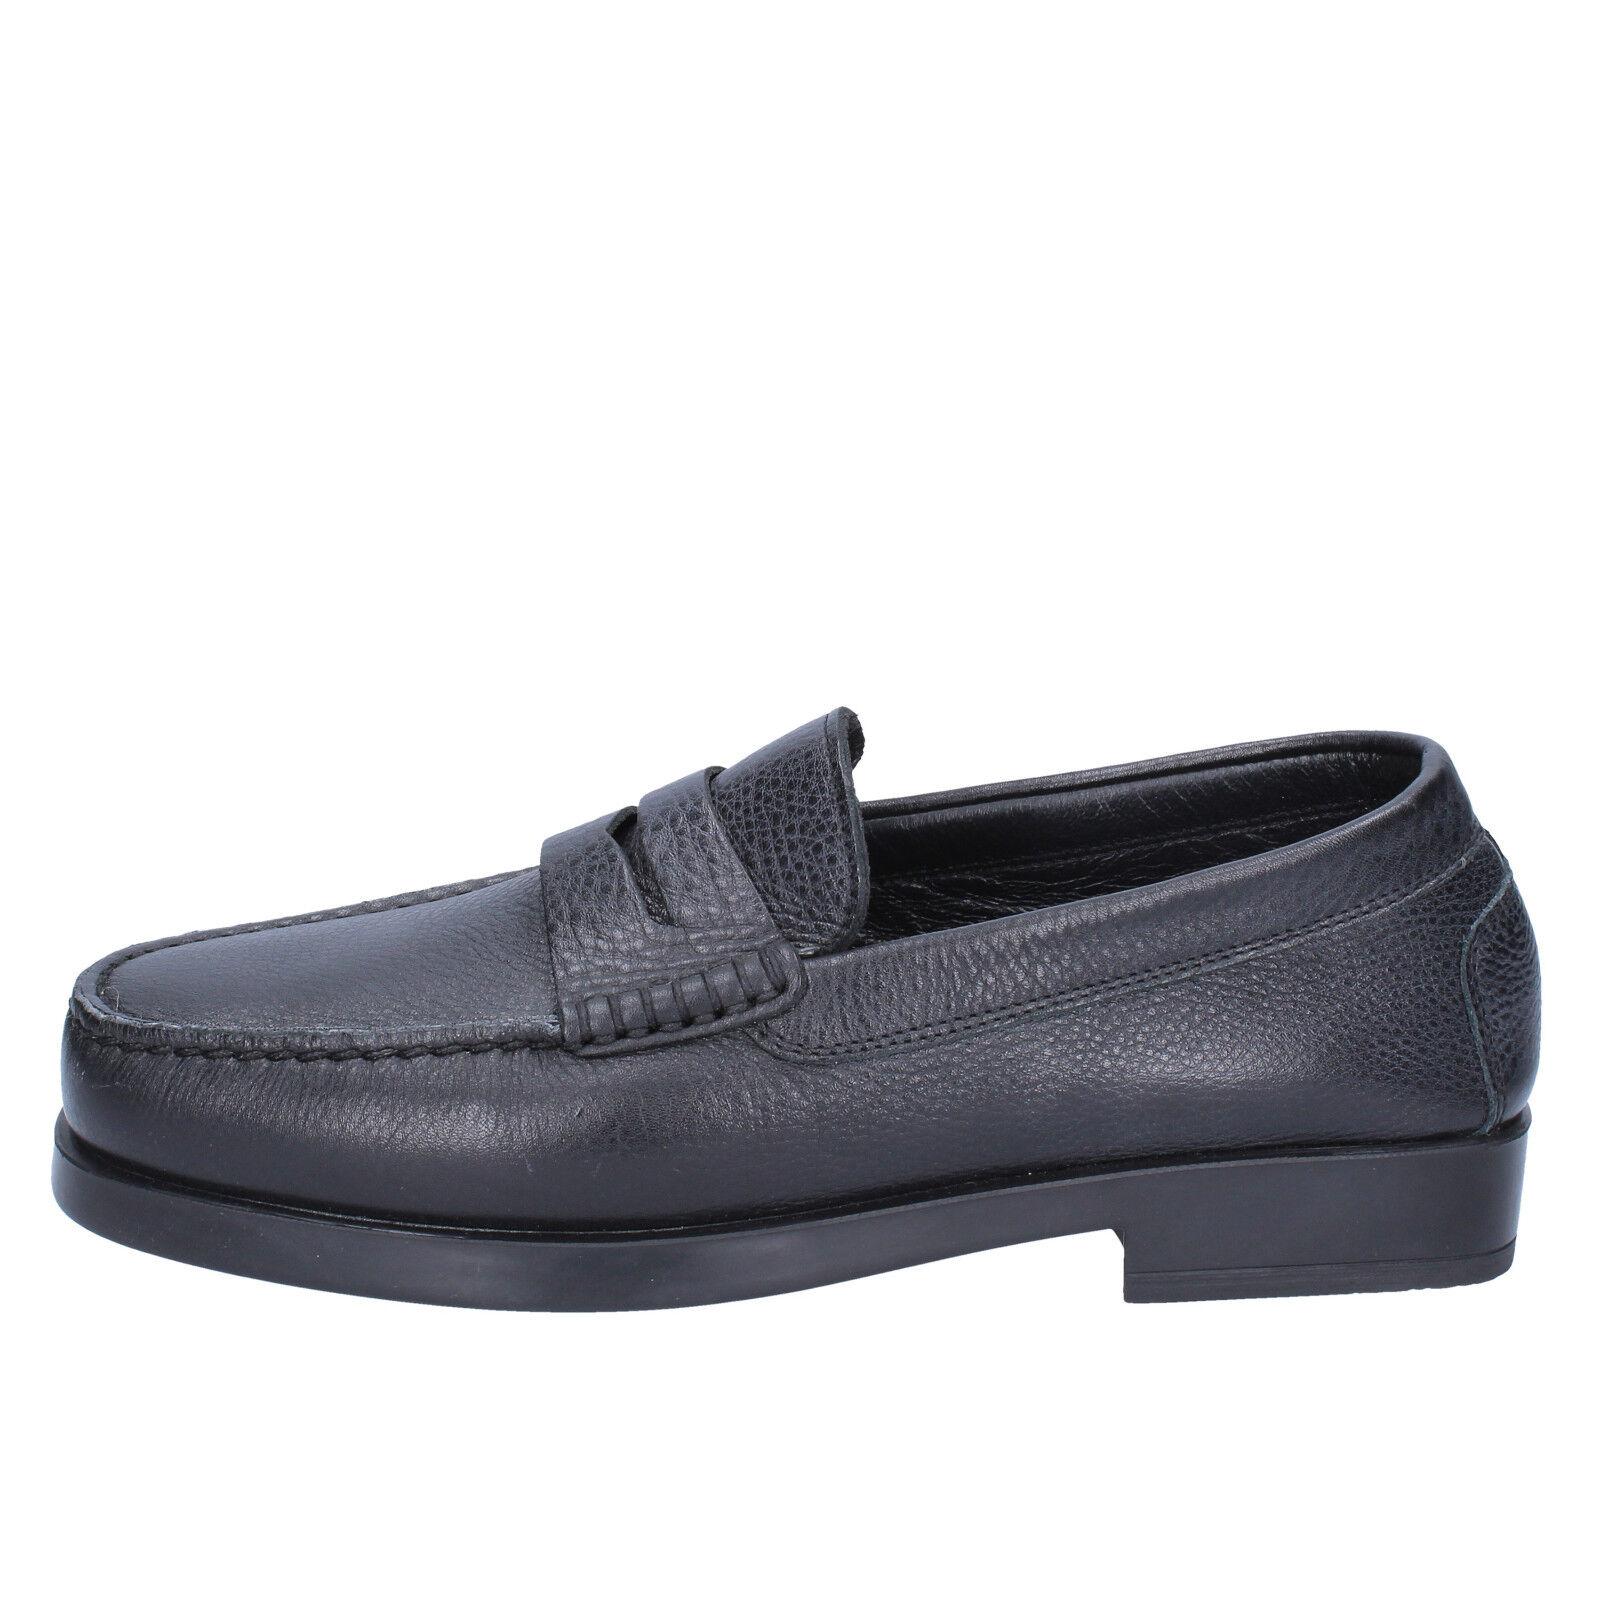 scarpe uomo K852 nero & SON 43 mocassini nero K852 pelle BX610-43 90cc8e